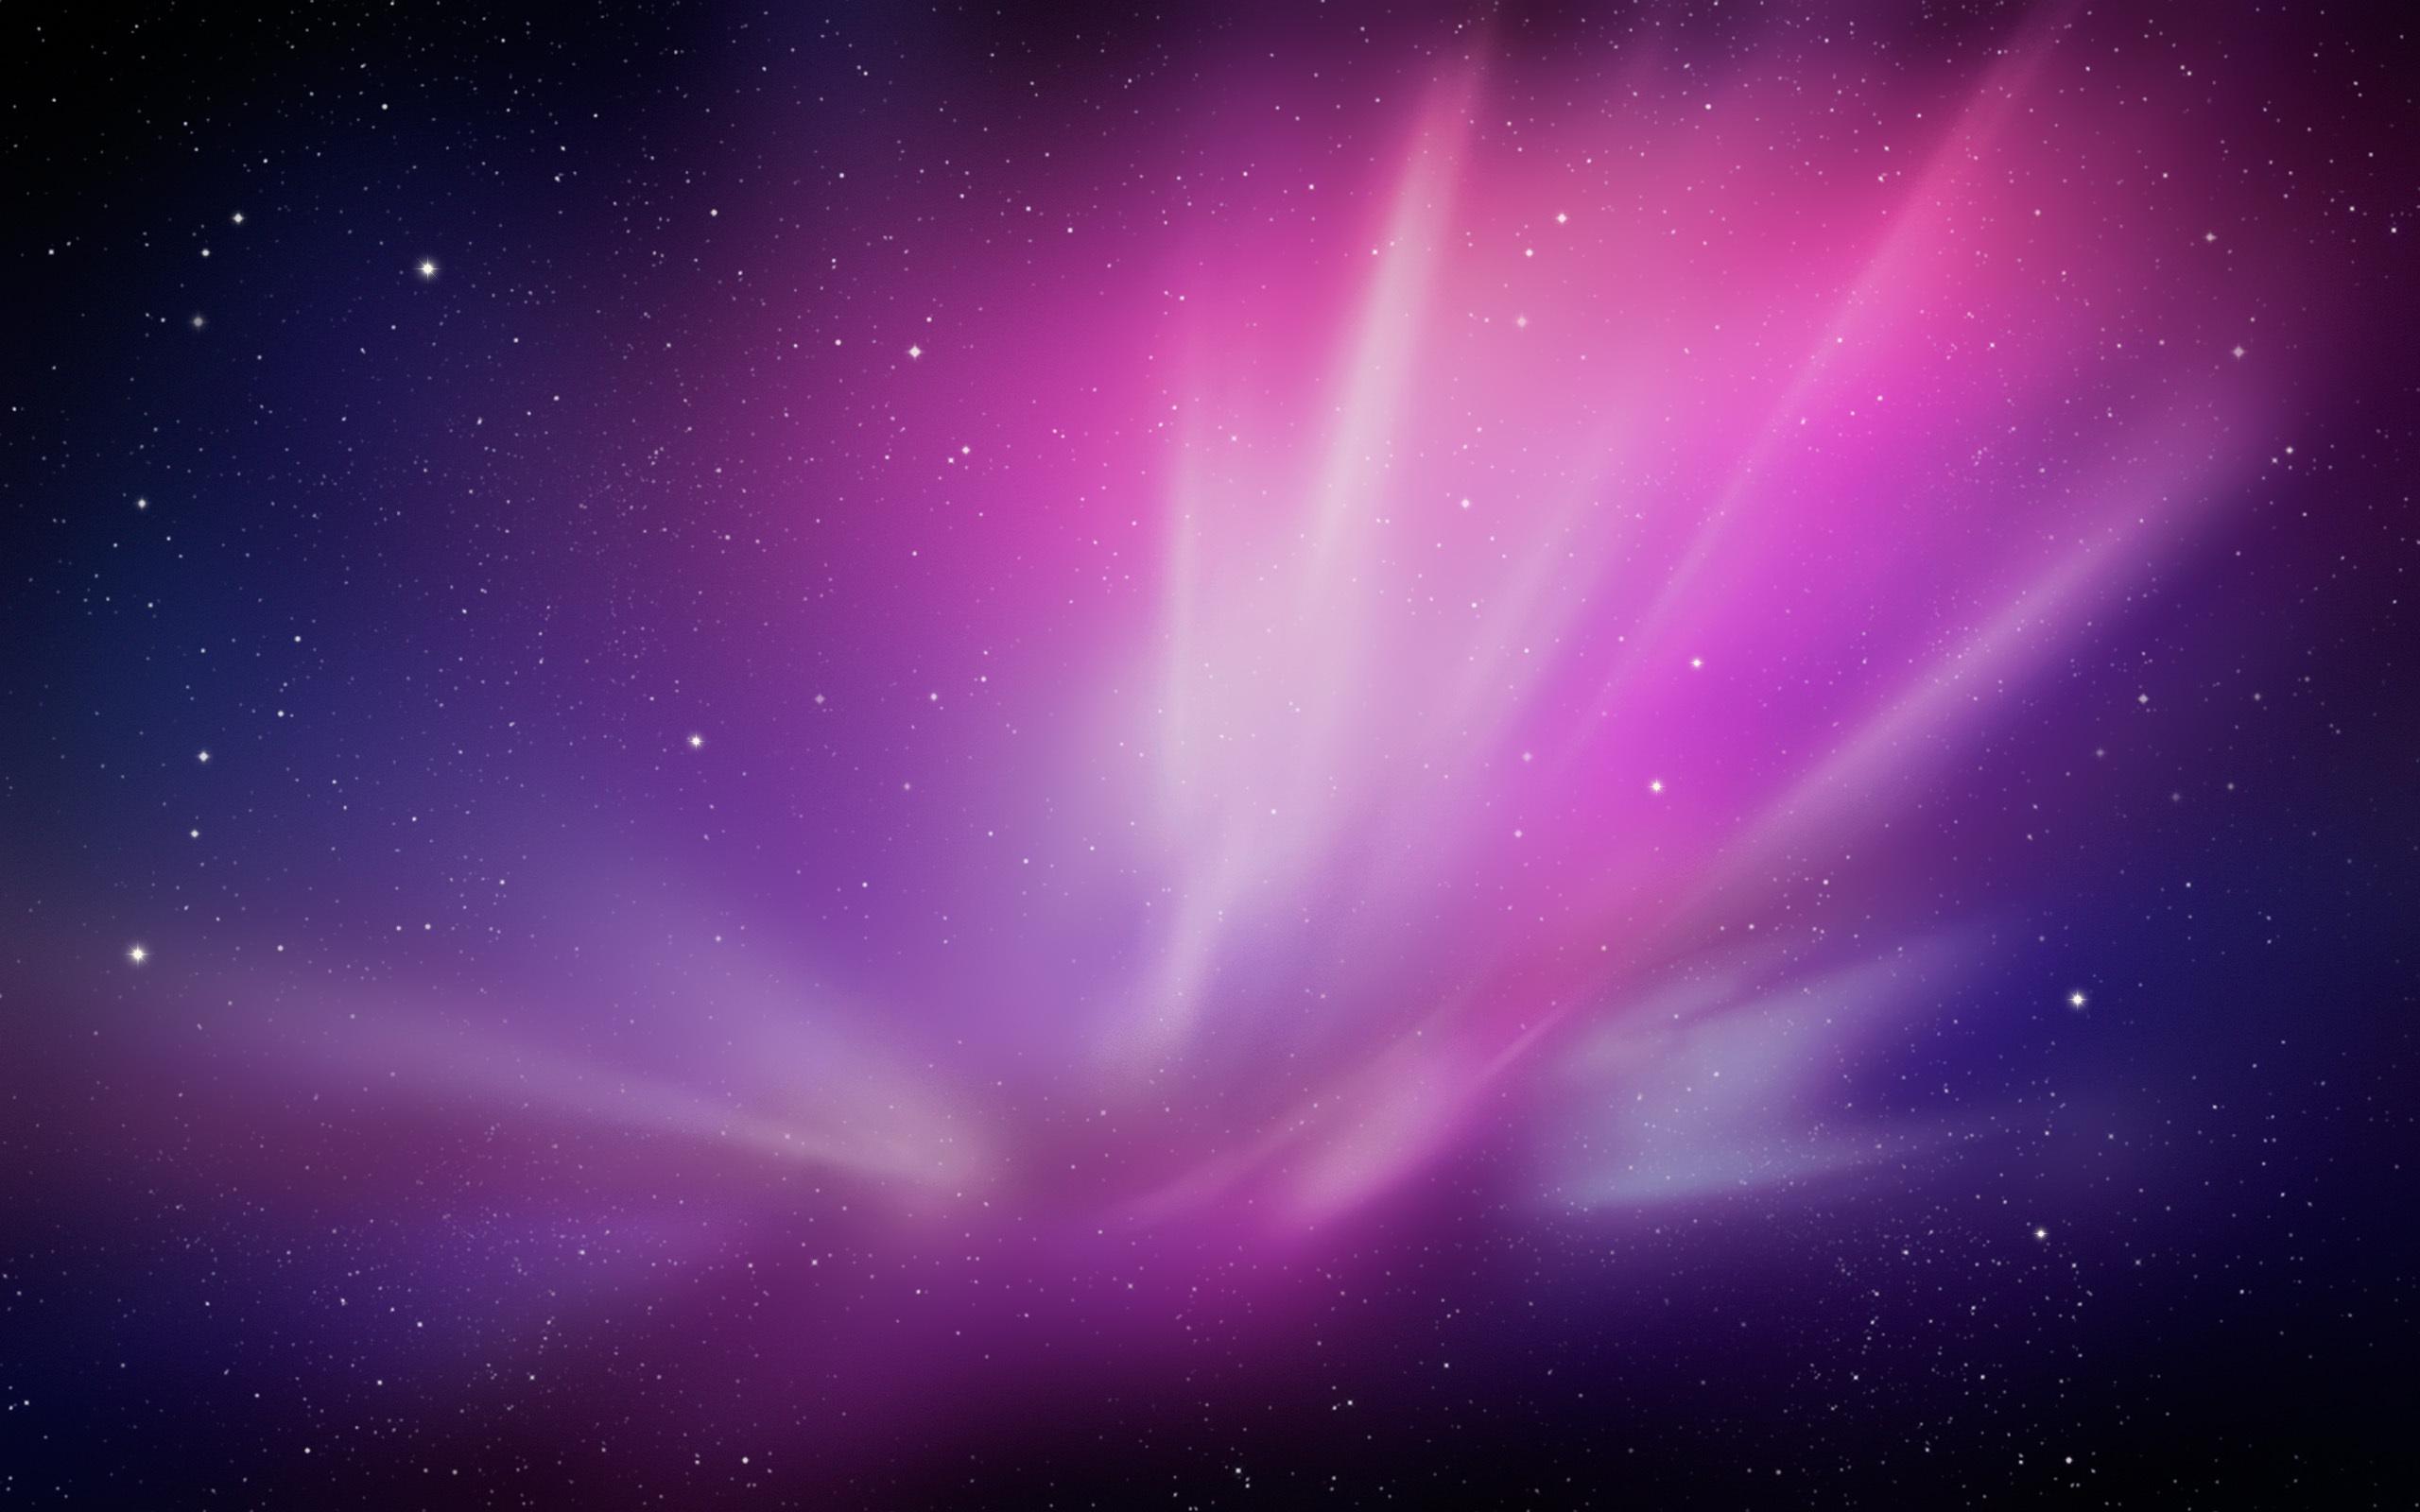 HD Galaxy Backgrounds Tumblr 2560x1600